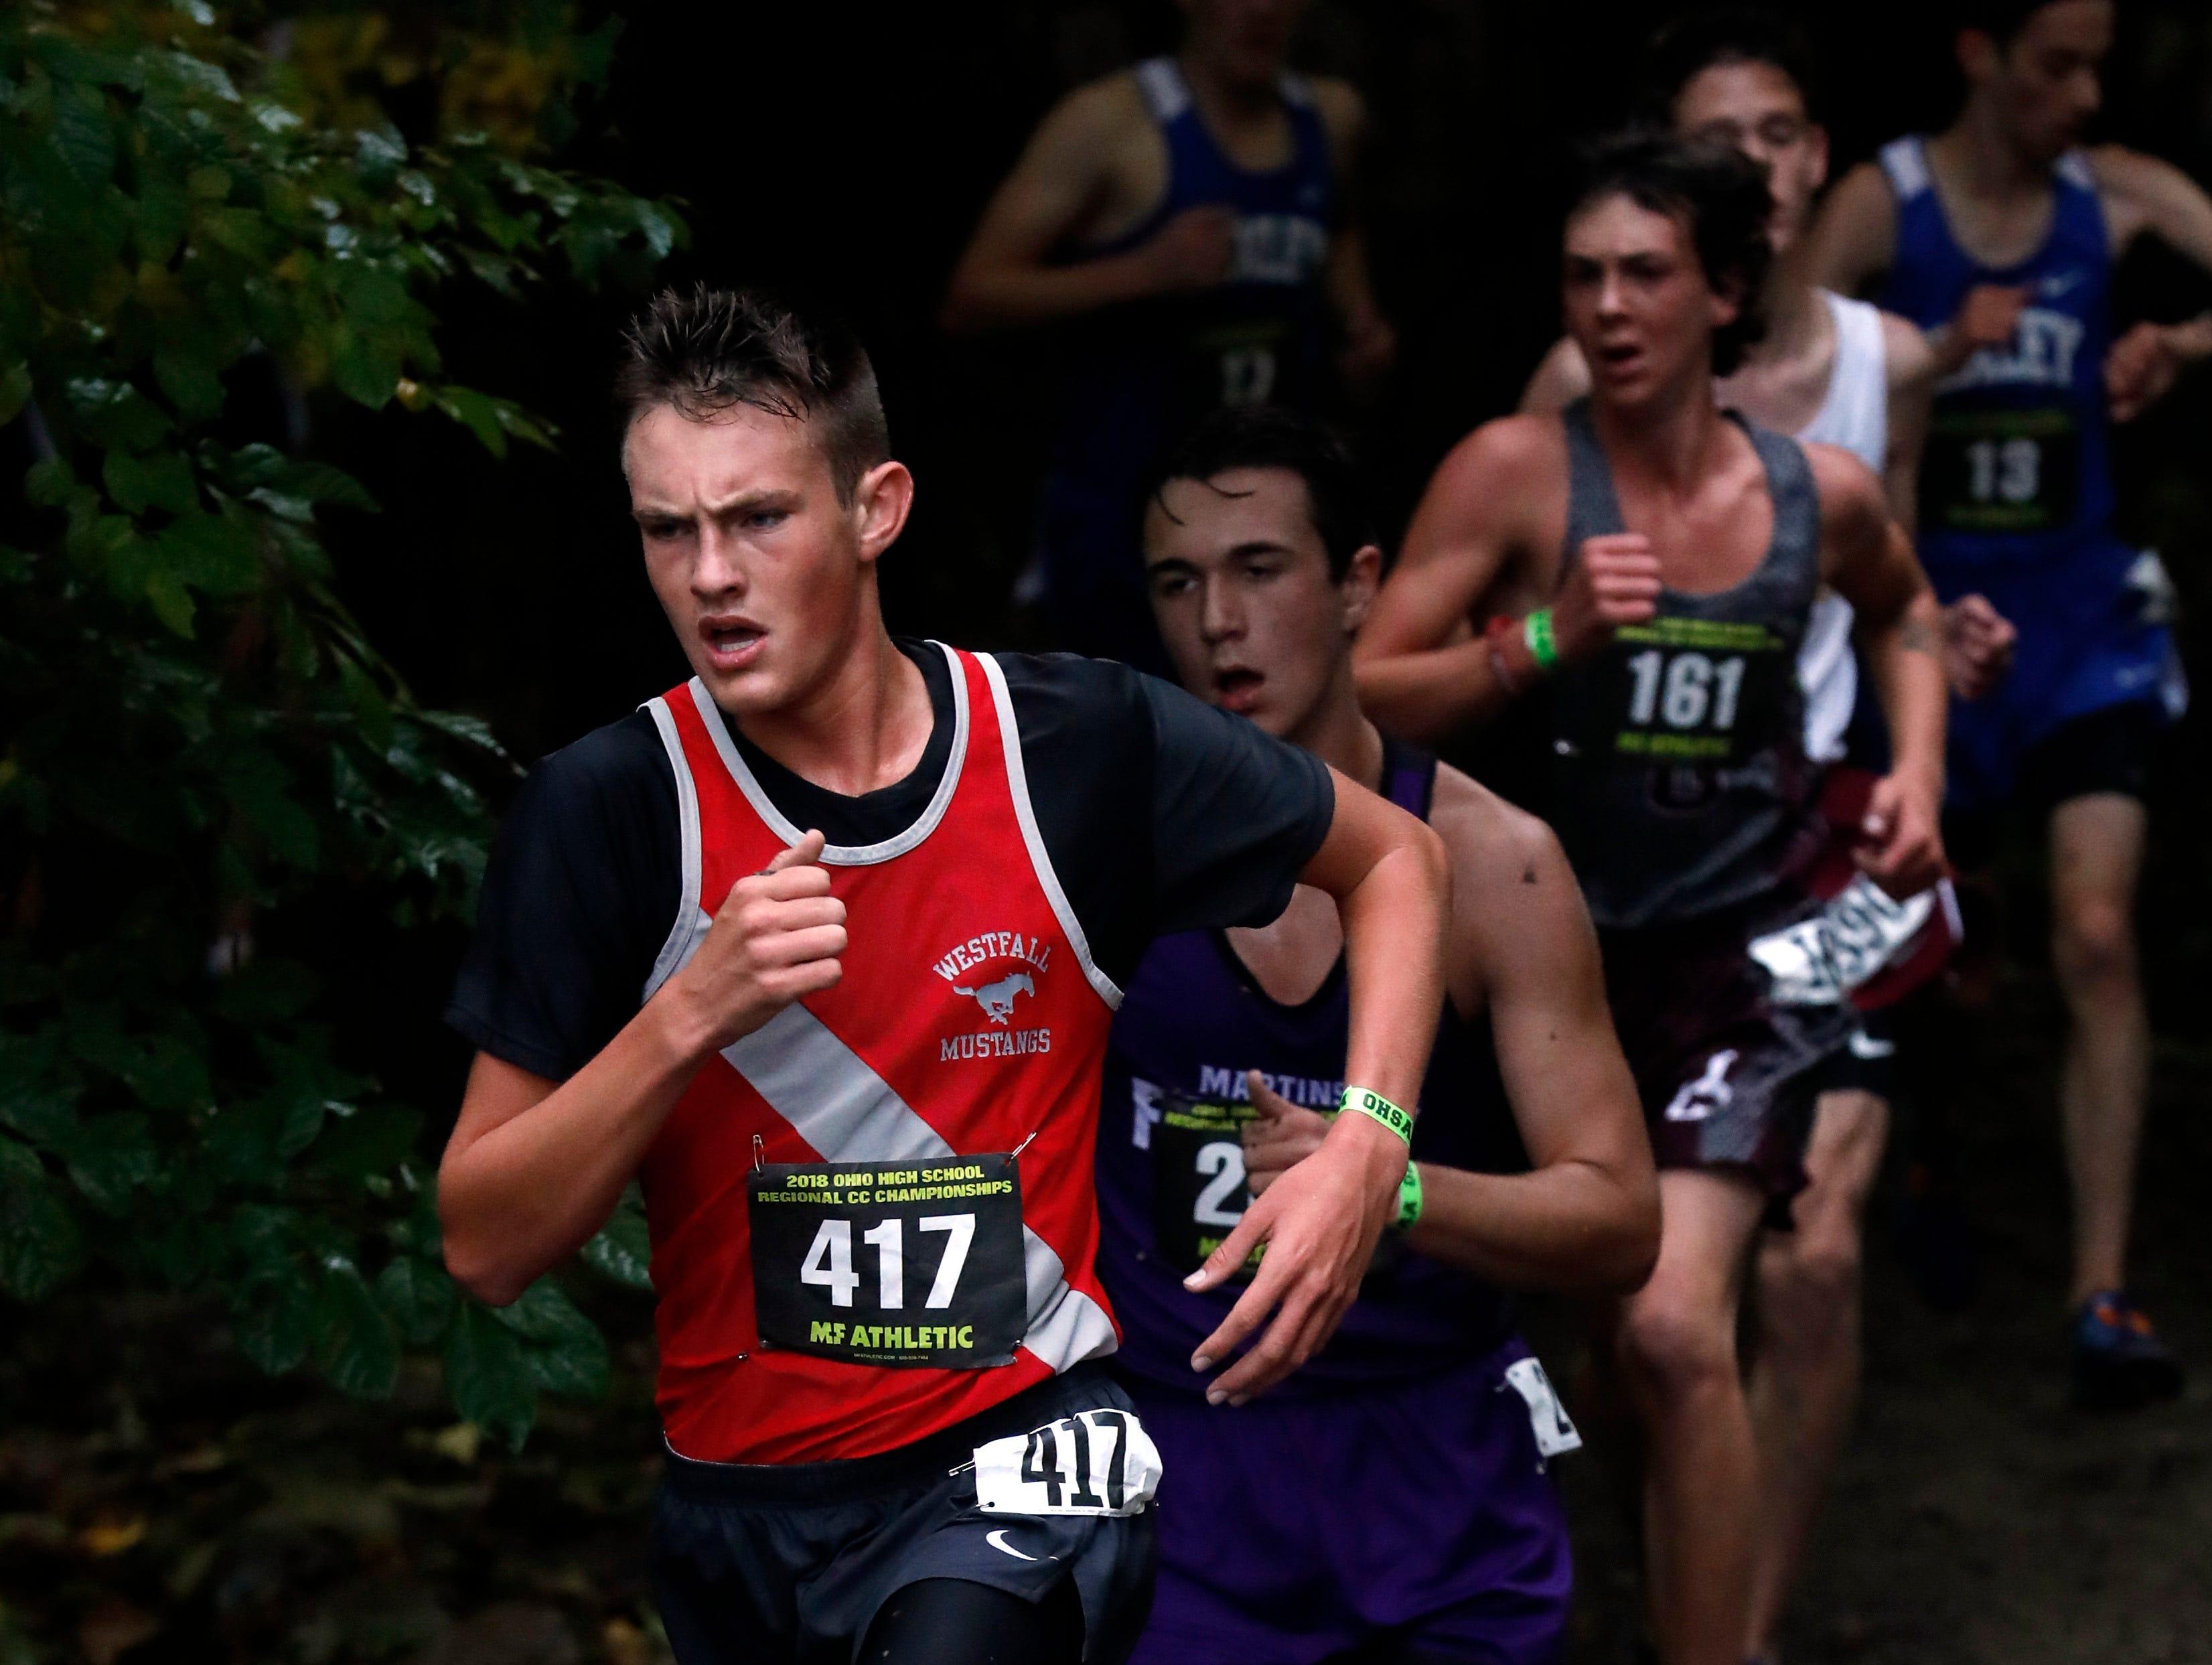 Westfall's Zach Shipley runs in the Regional Cross Country meet Saturday, Oct. 27, 2018, at Pickerington North High School in Pickerington.